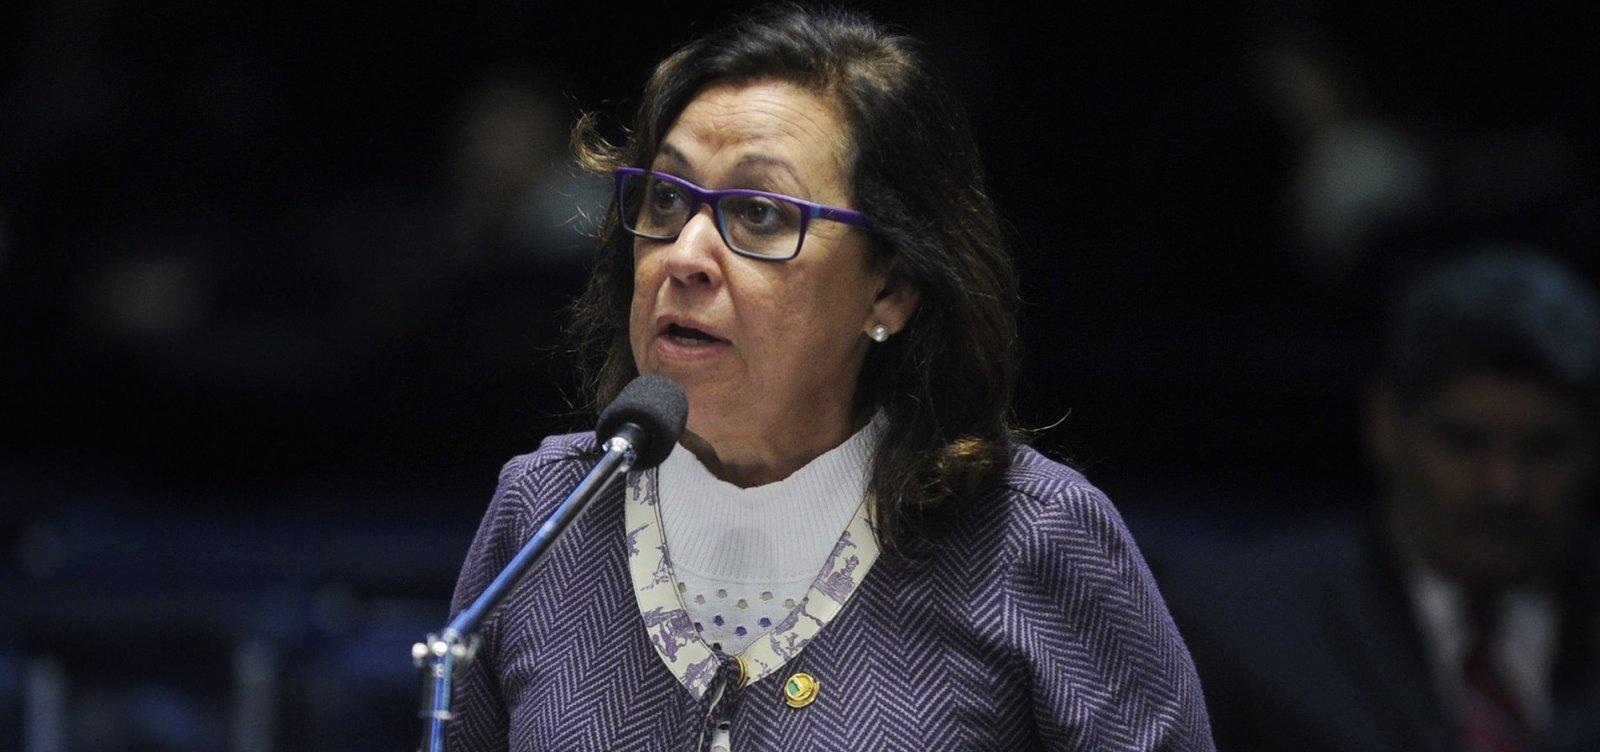 Lídice diz que é 'lamentável' apoio de Calmon a Bolsonaro: 'Não combina'